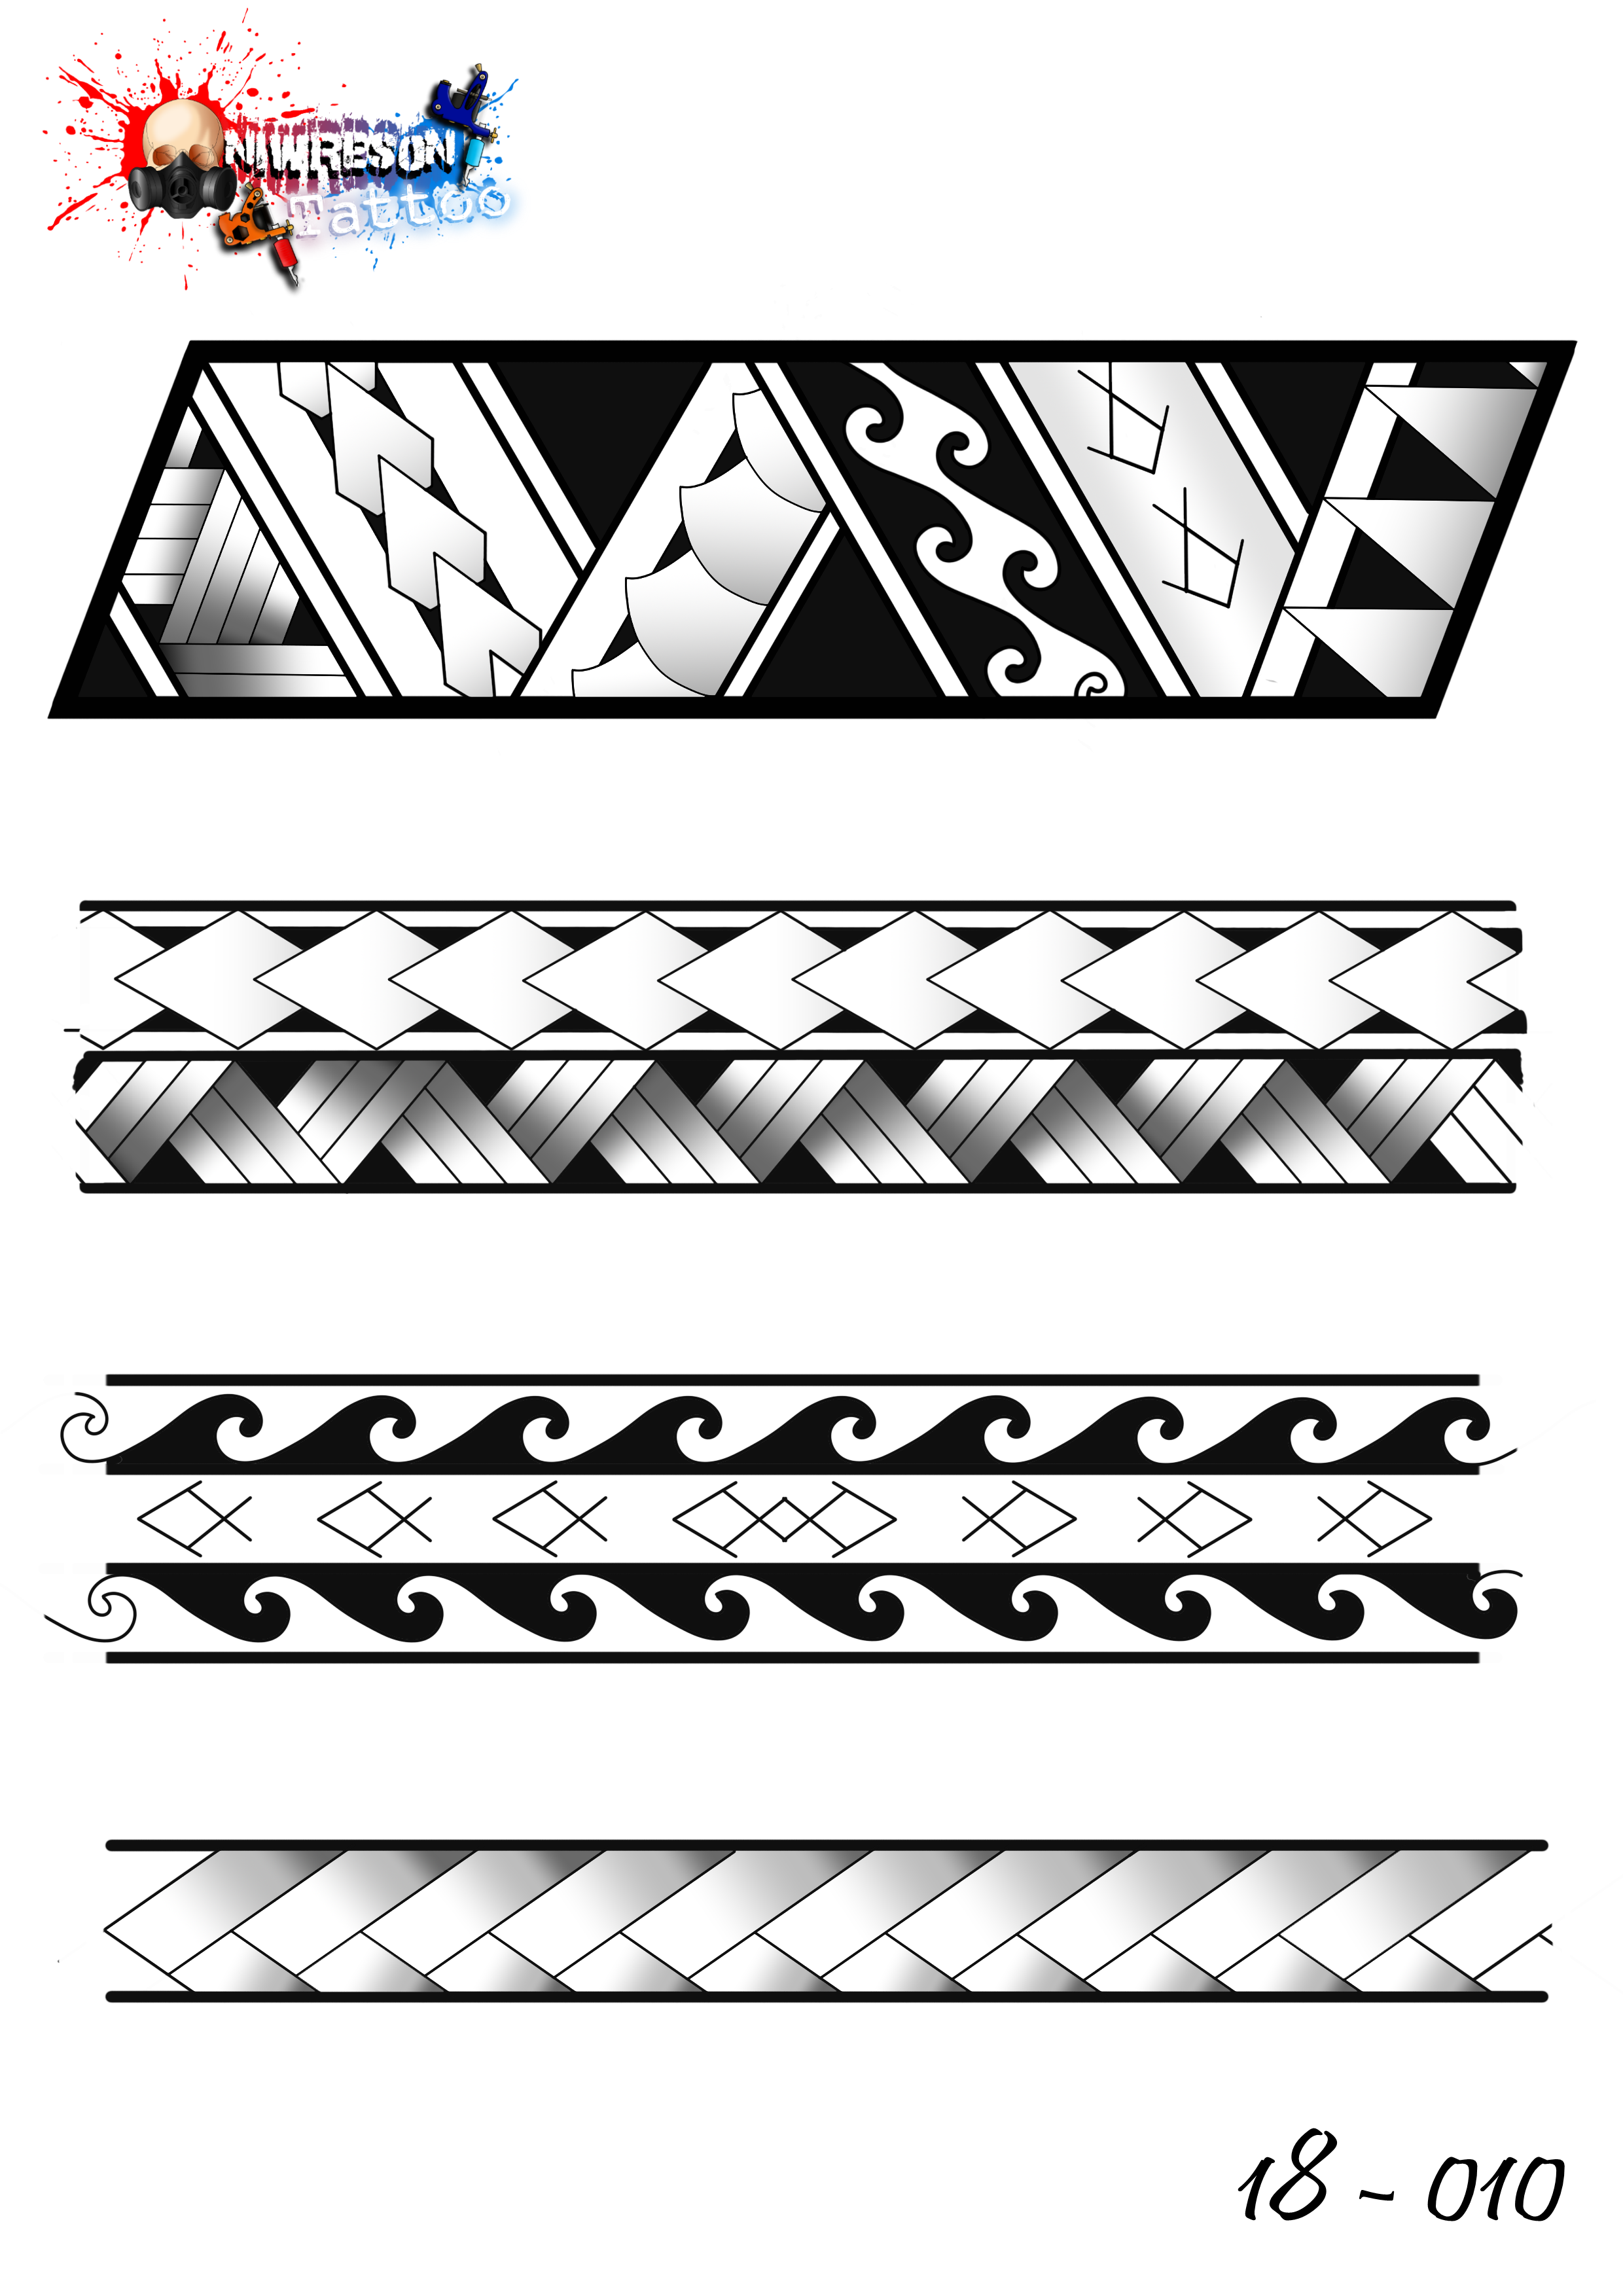 Maori Band Tattoo Design: Maori Tattoo Designs New Zealand